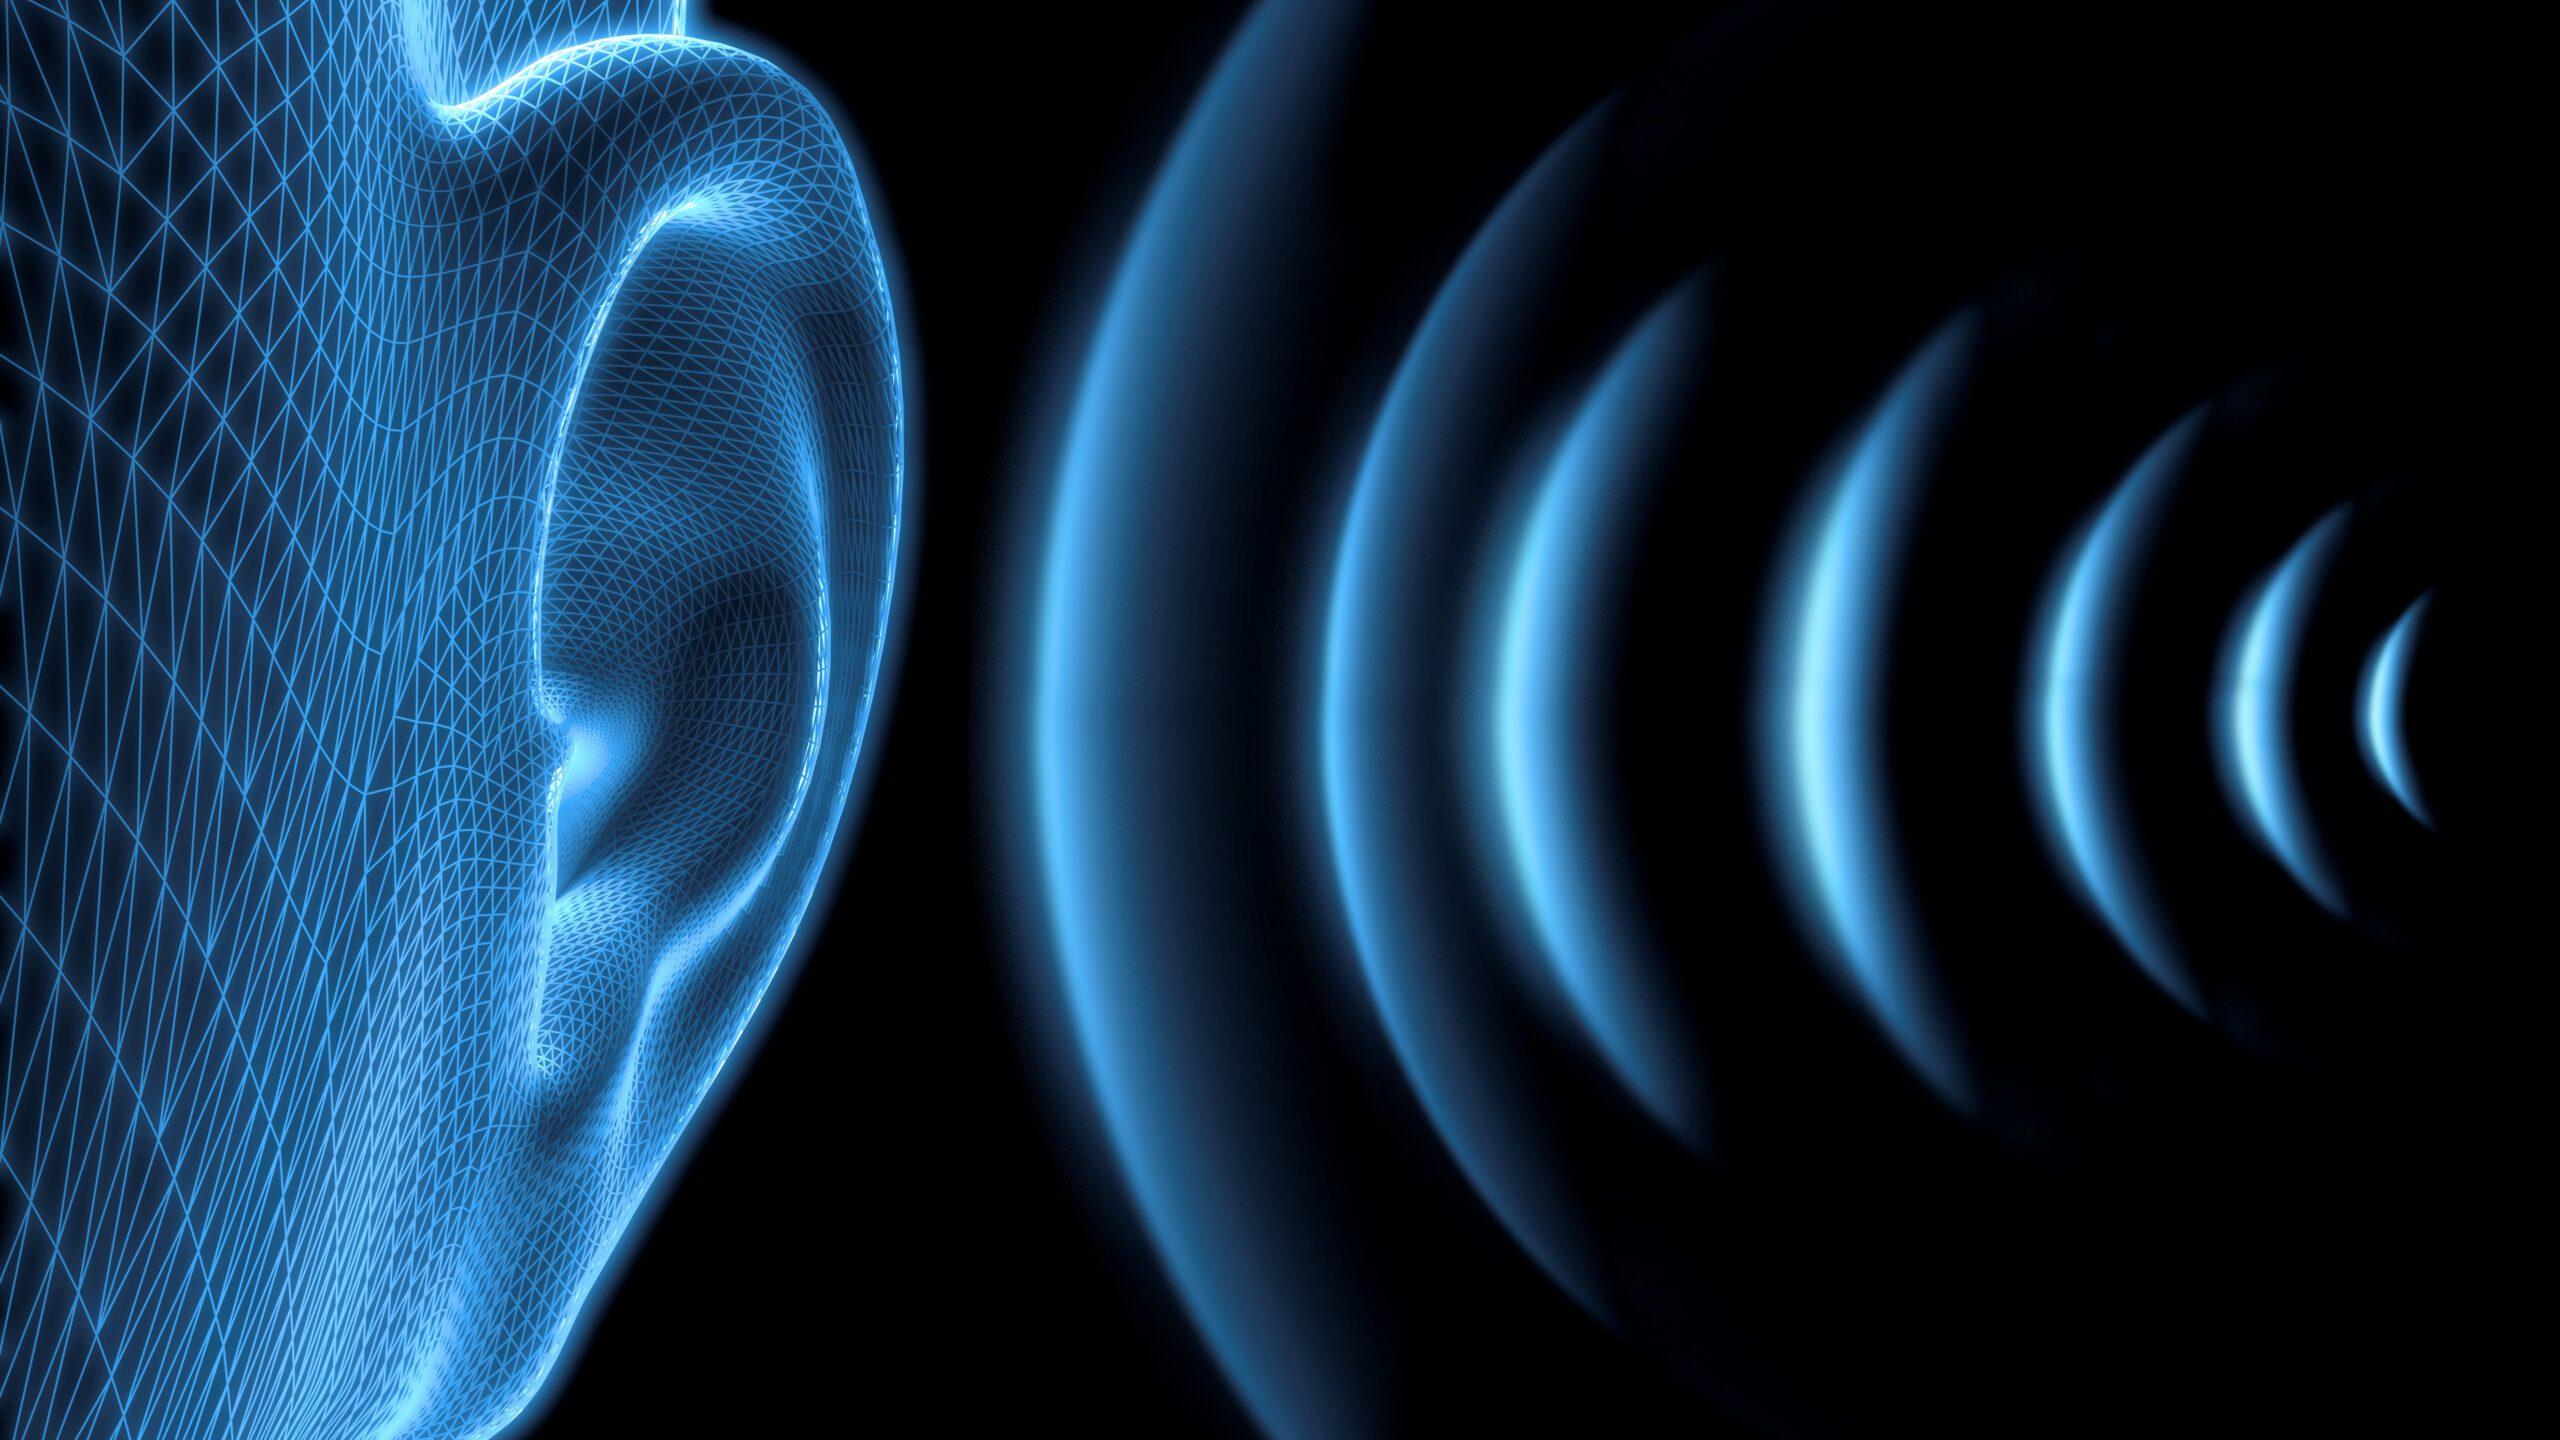 Blue Ear with sound waves - 3D illustration